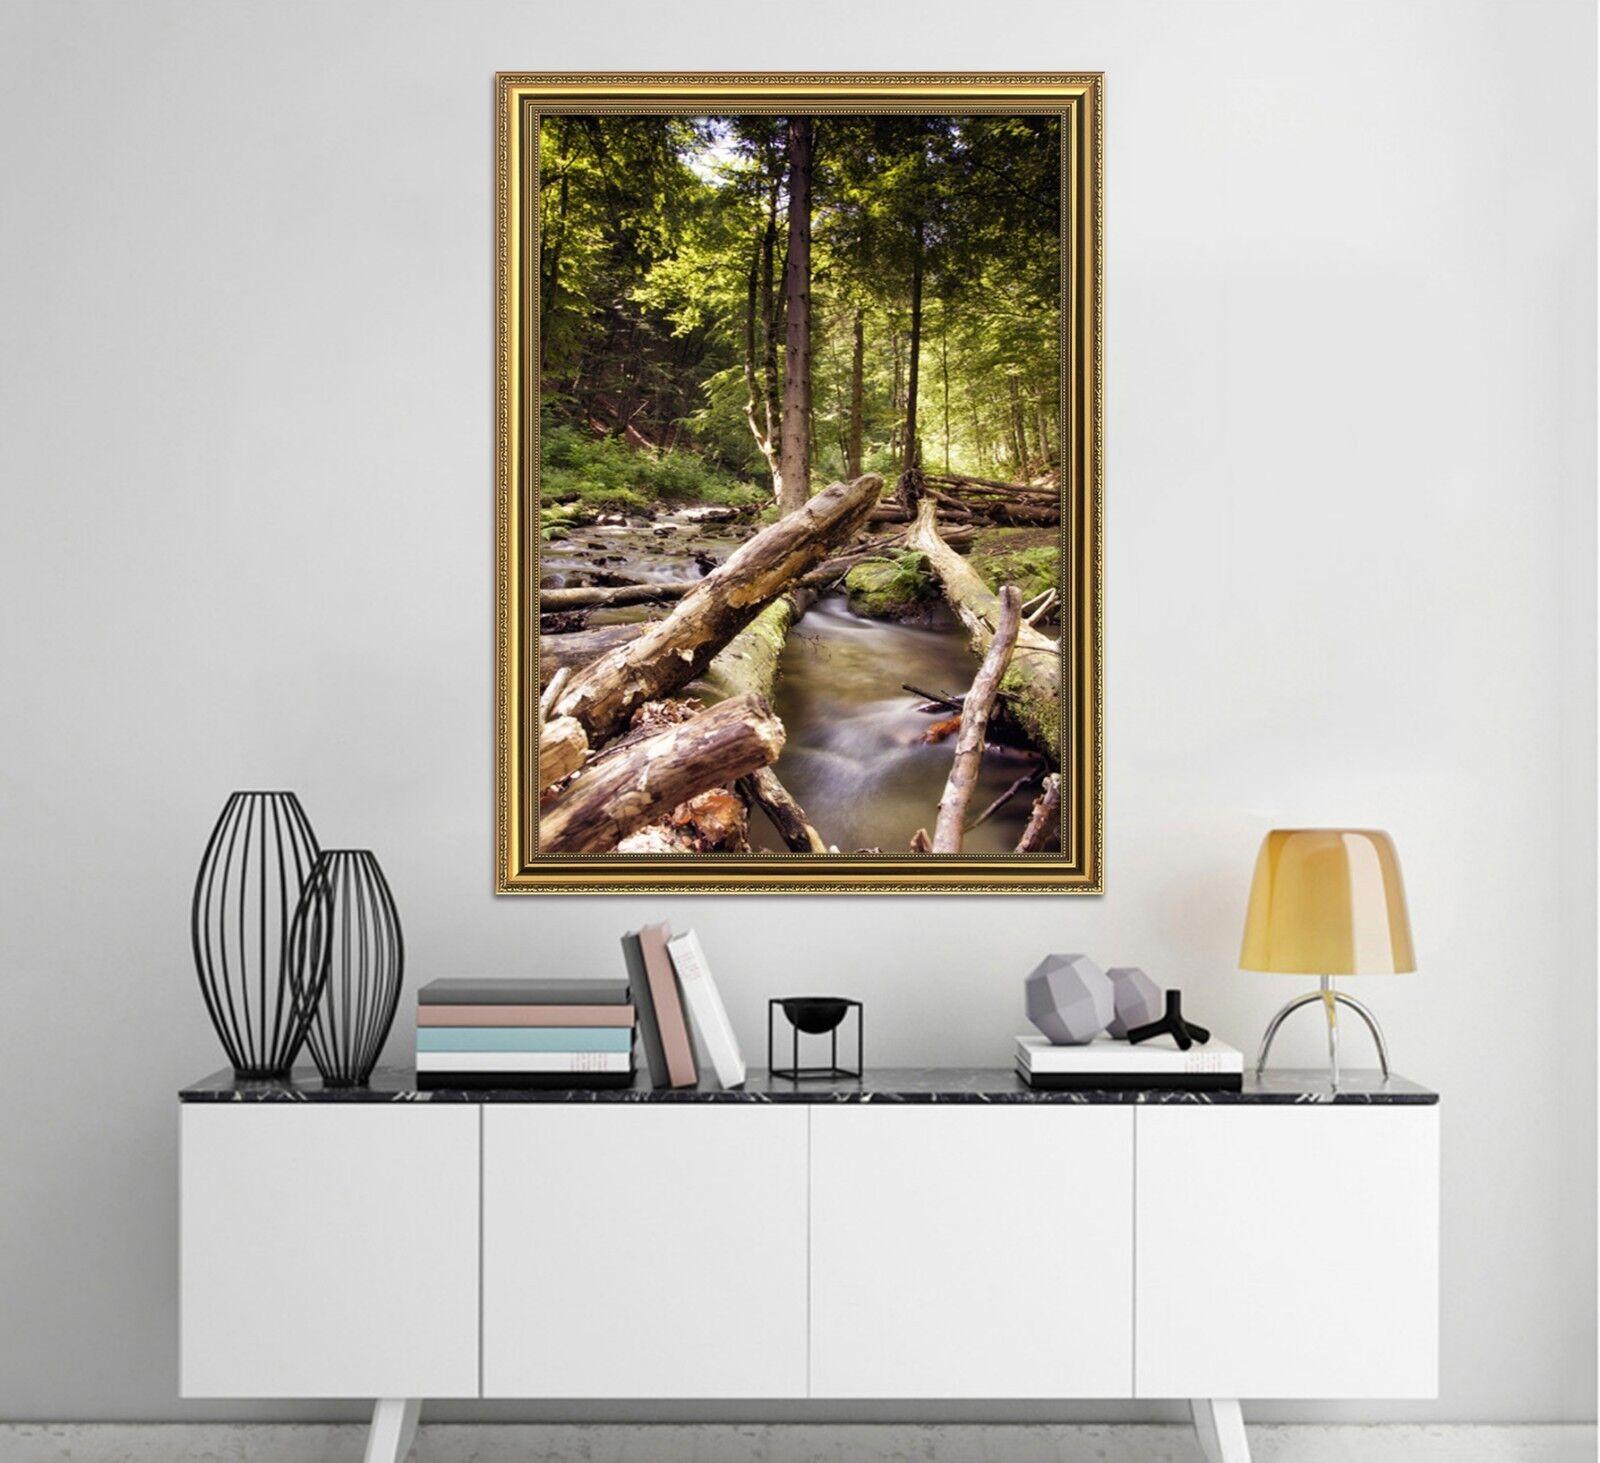 Bosque árboles 3D 2 Póster Enmarcado Creek Decoración del Hogar Pintura de Impresión Arte AJ Wallpaper